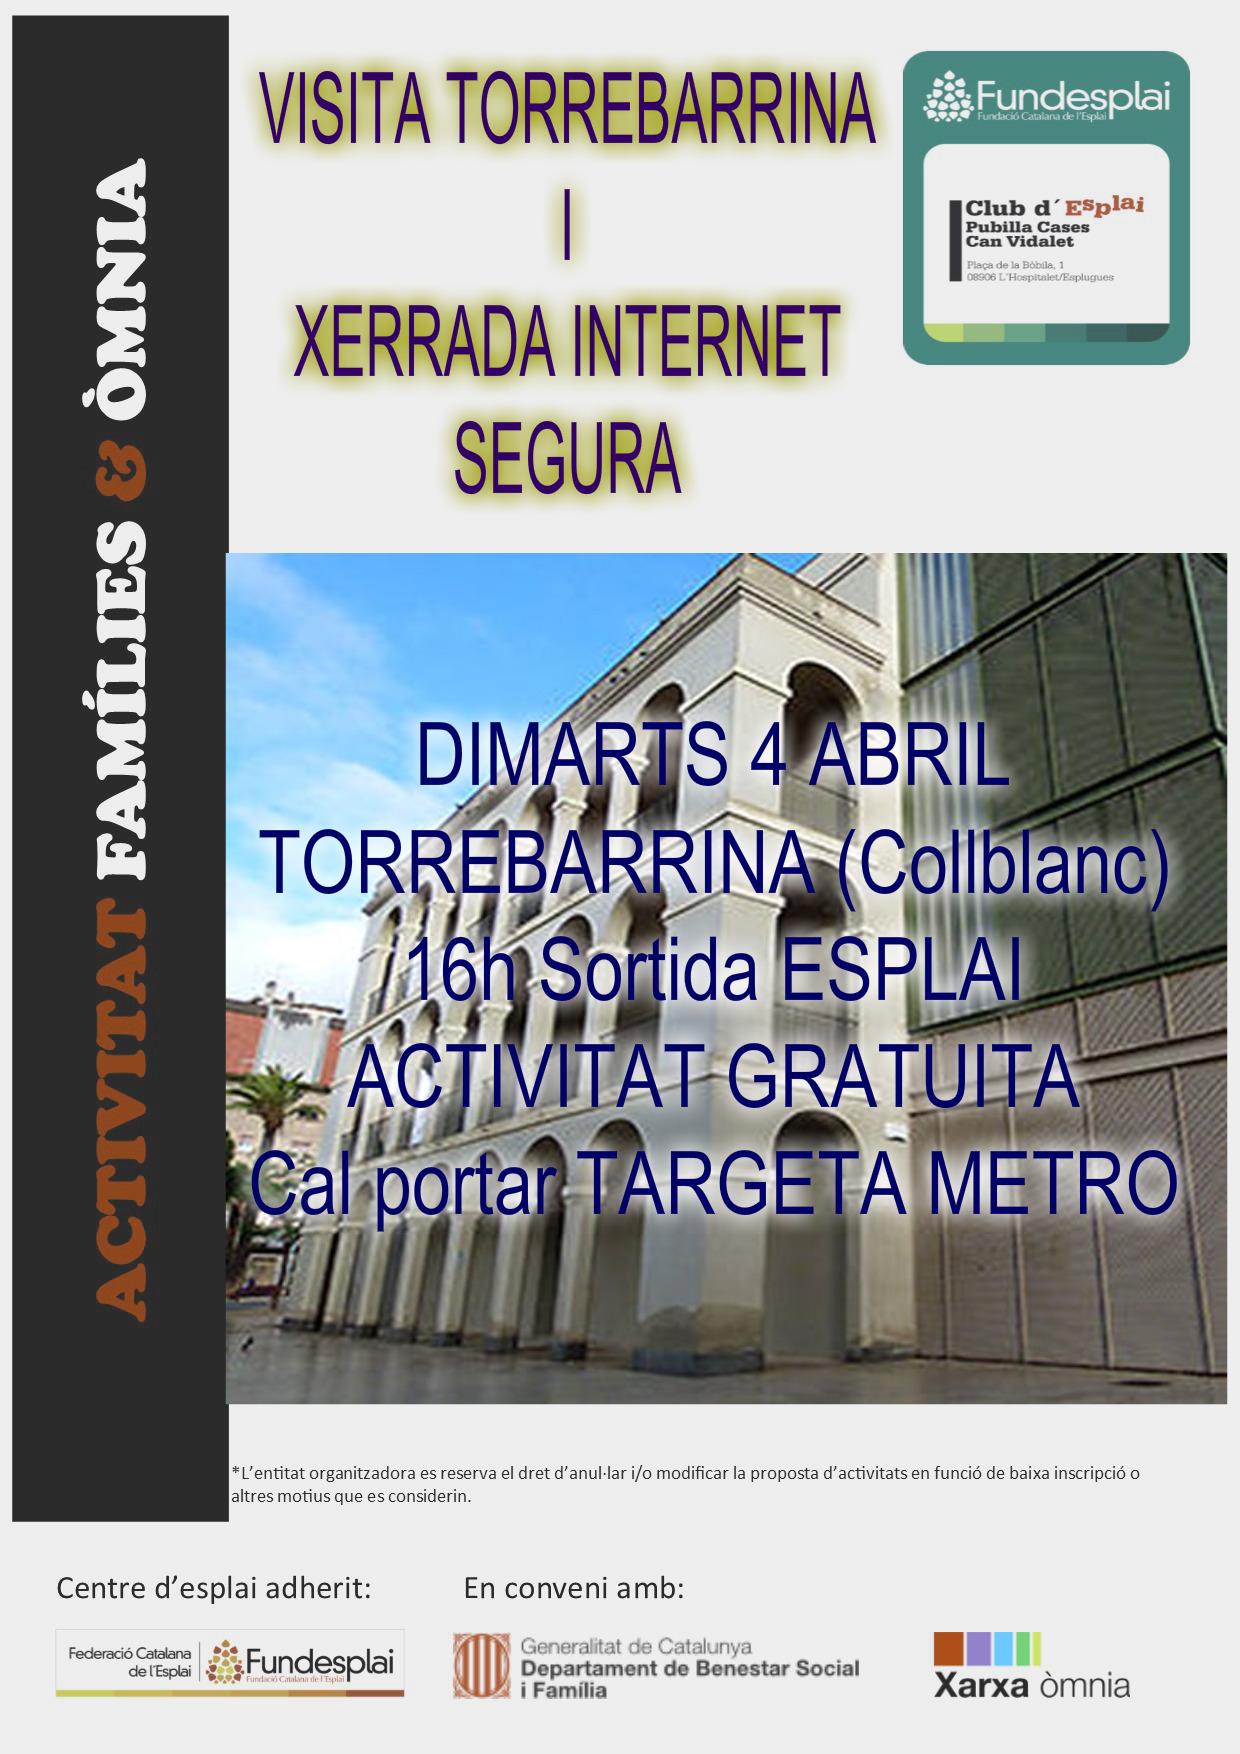 pizap.com14903525649291